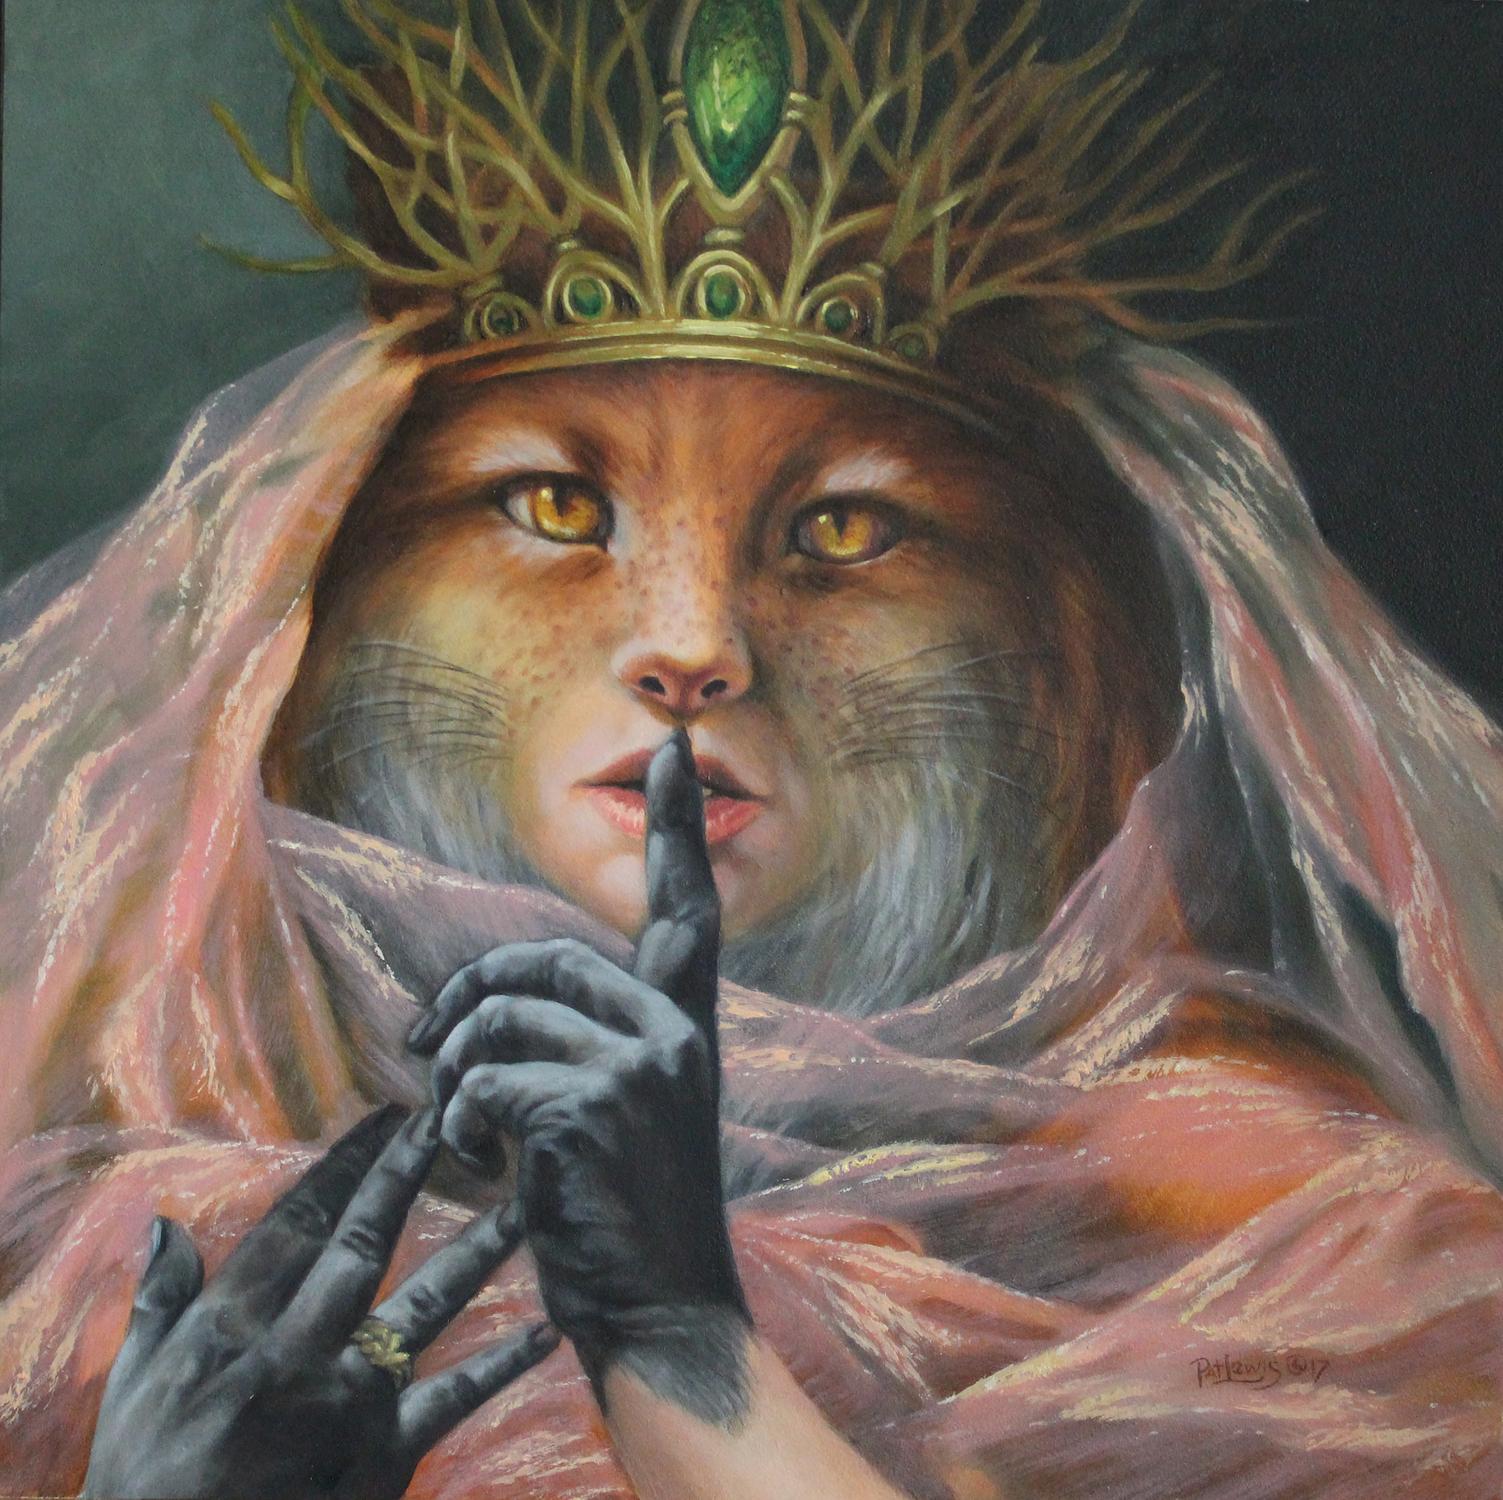 Fox Queen Artwork by Pat morrissey-Lewis